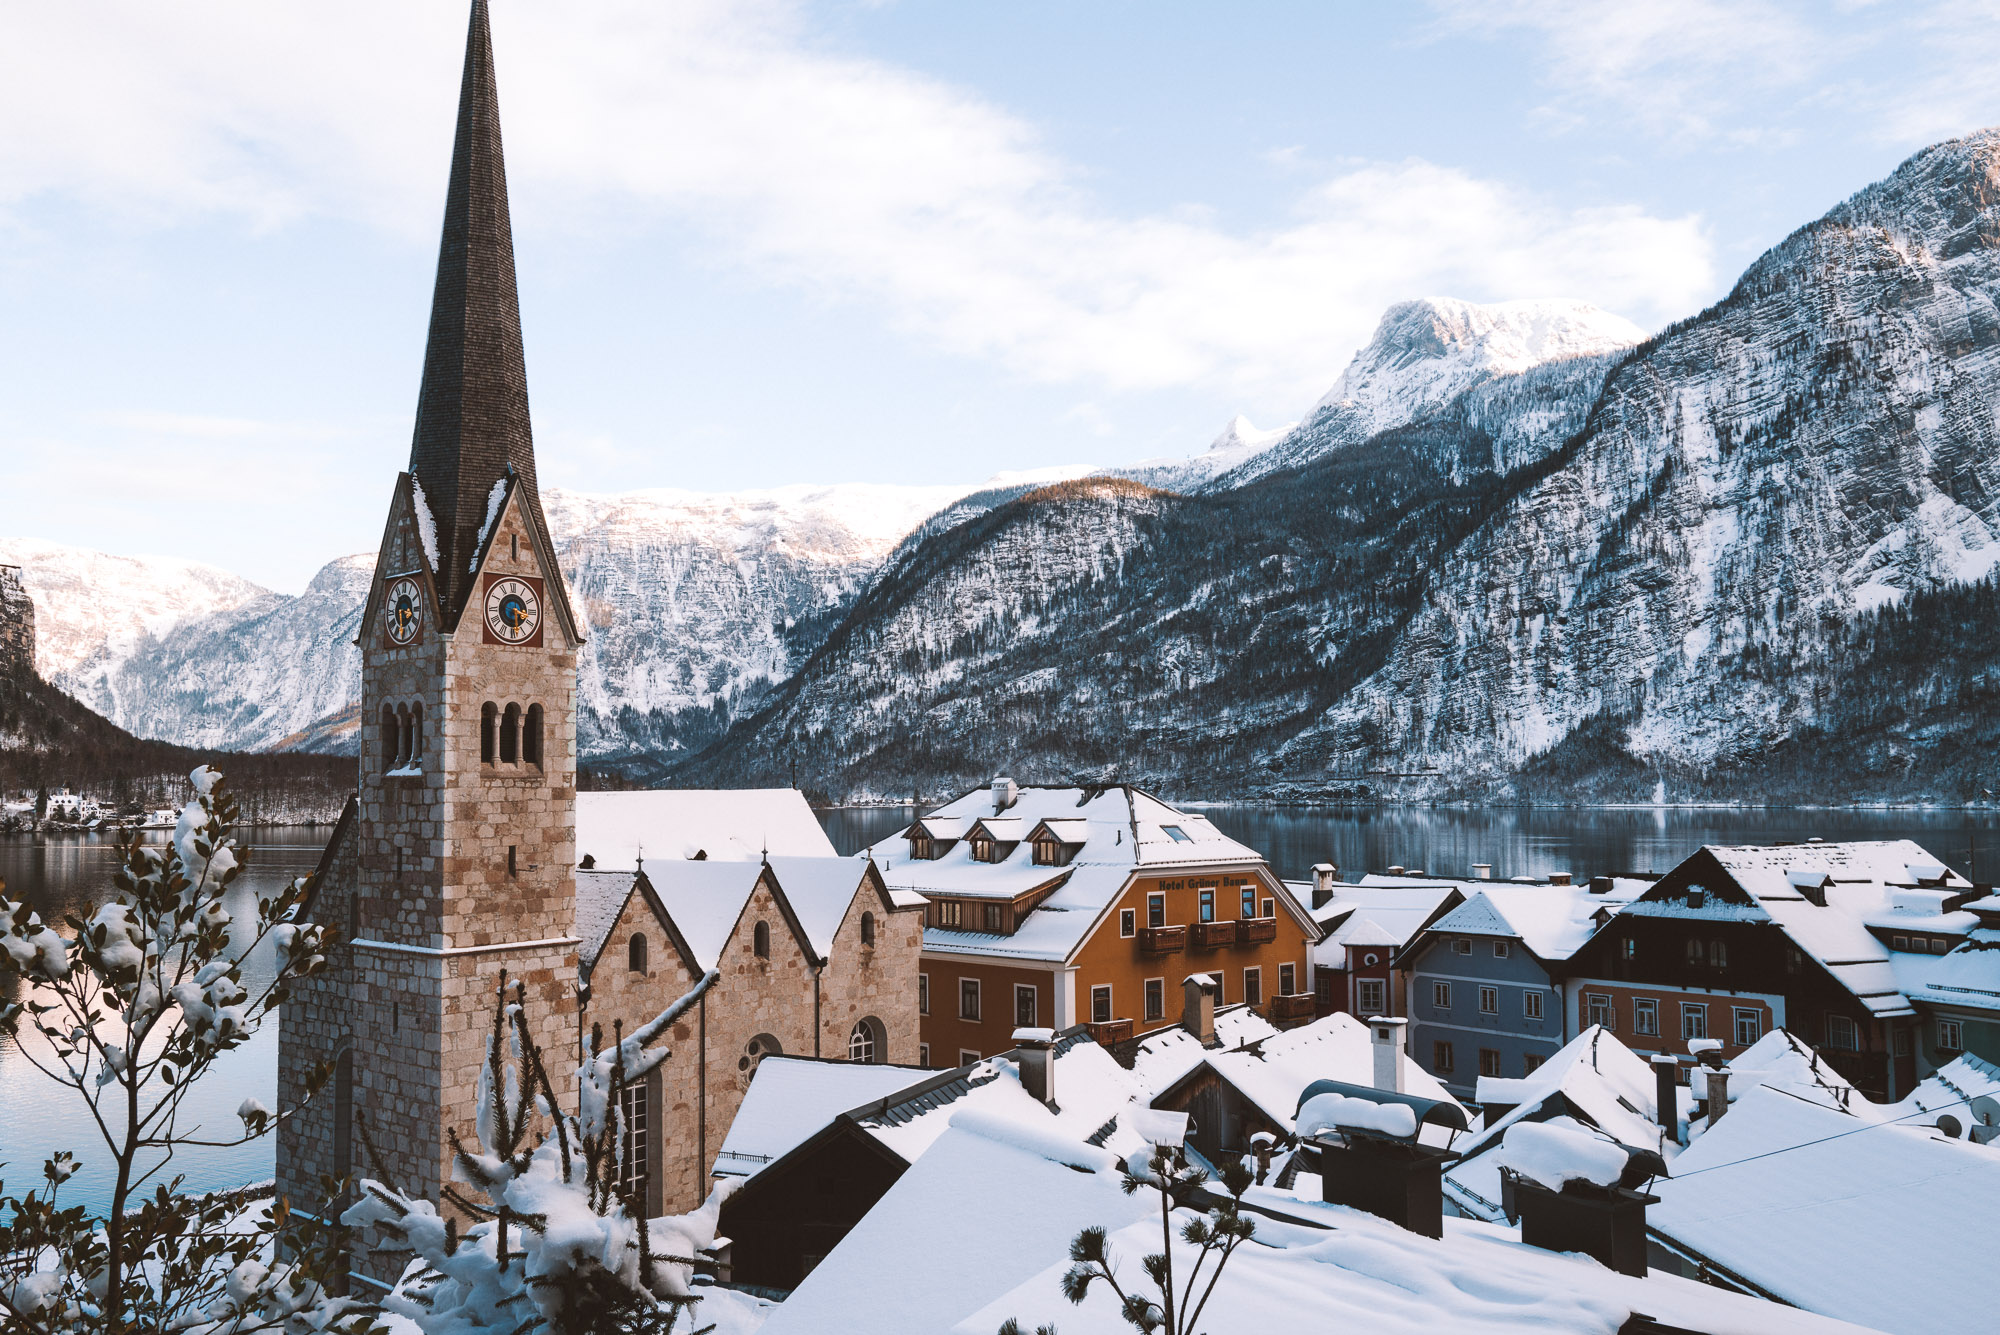 Hallstatt church and mountain range in Austria